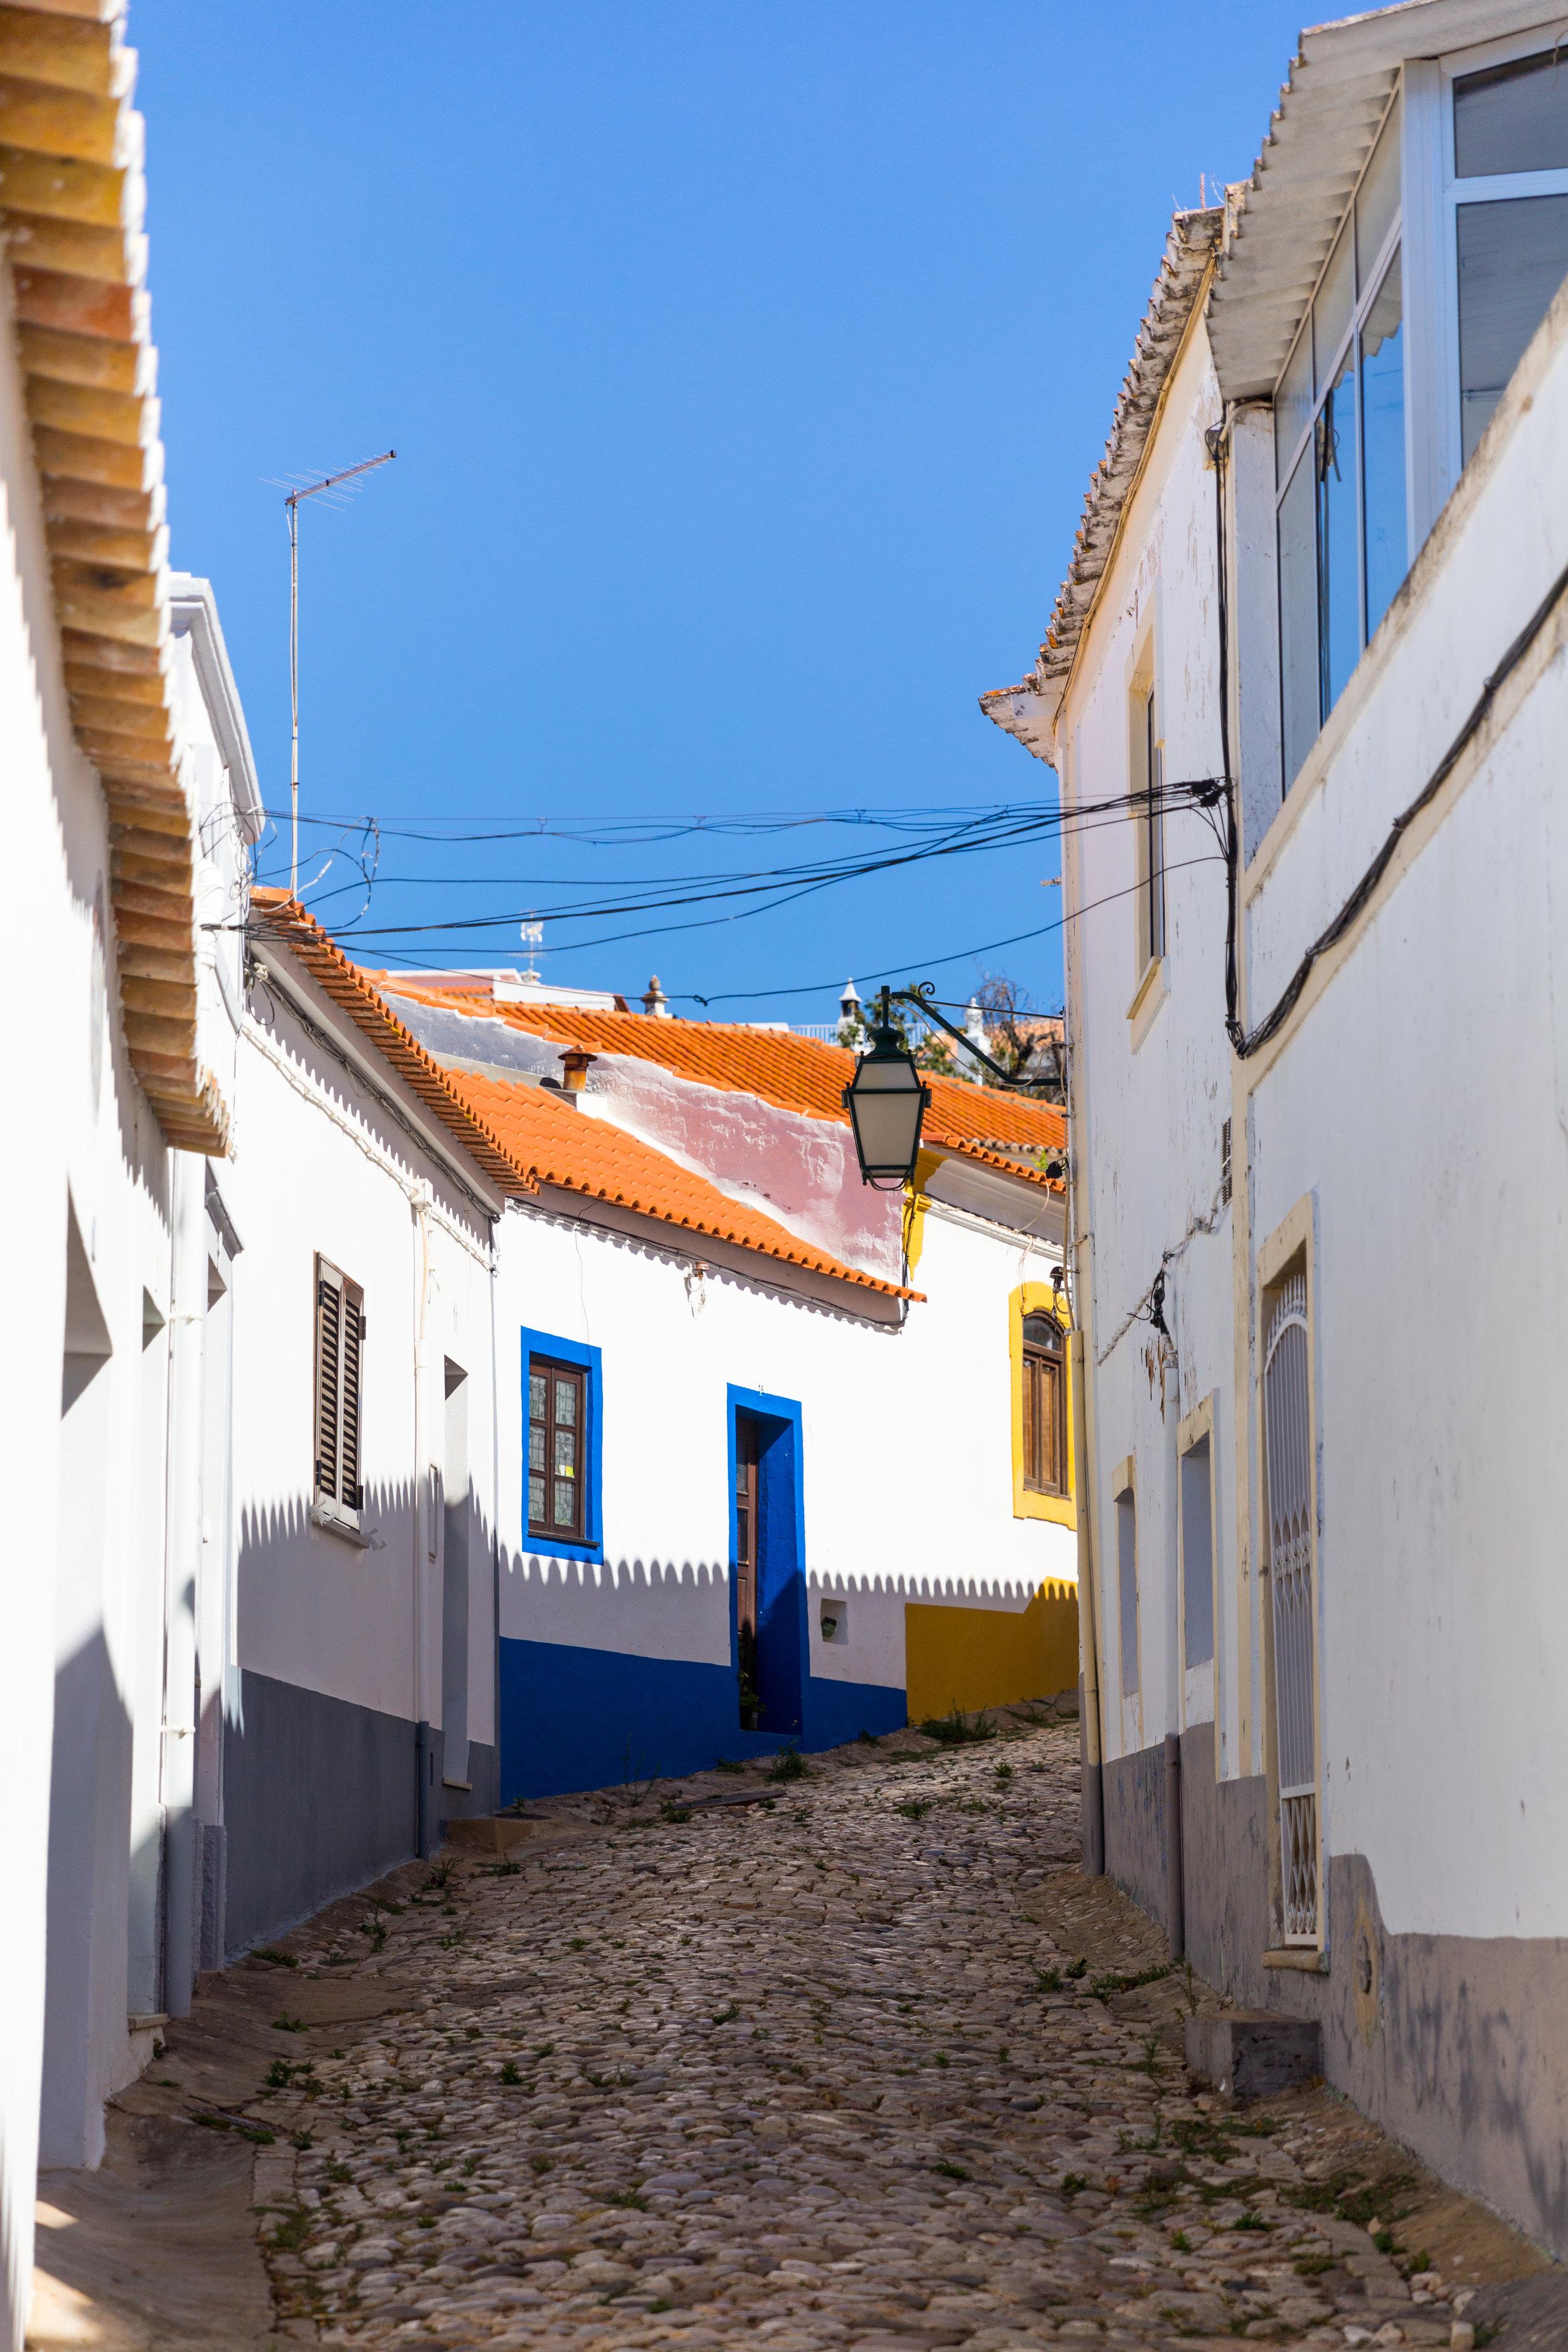 Portugal Algarve Summer Travel-3.jpg